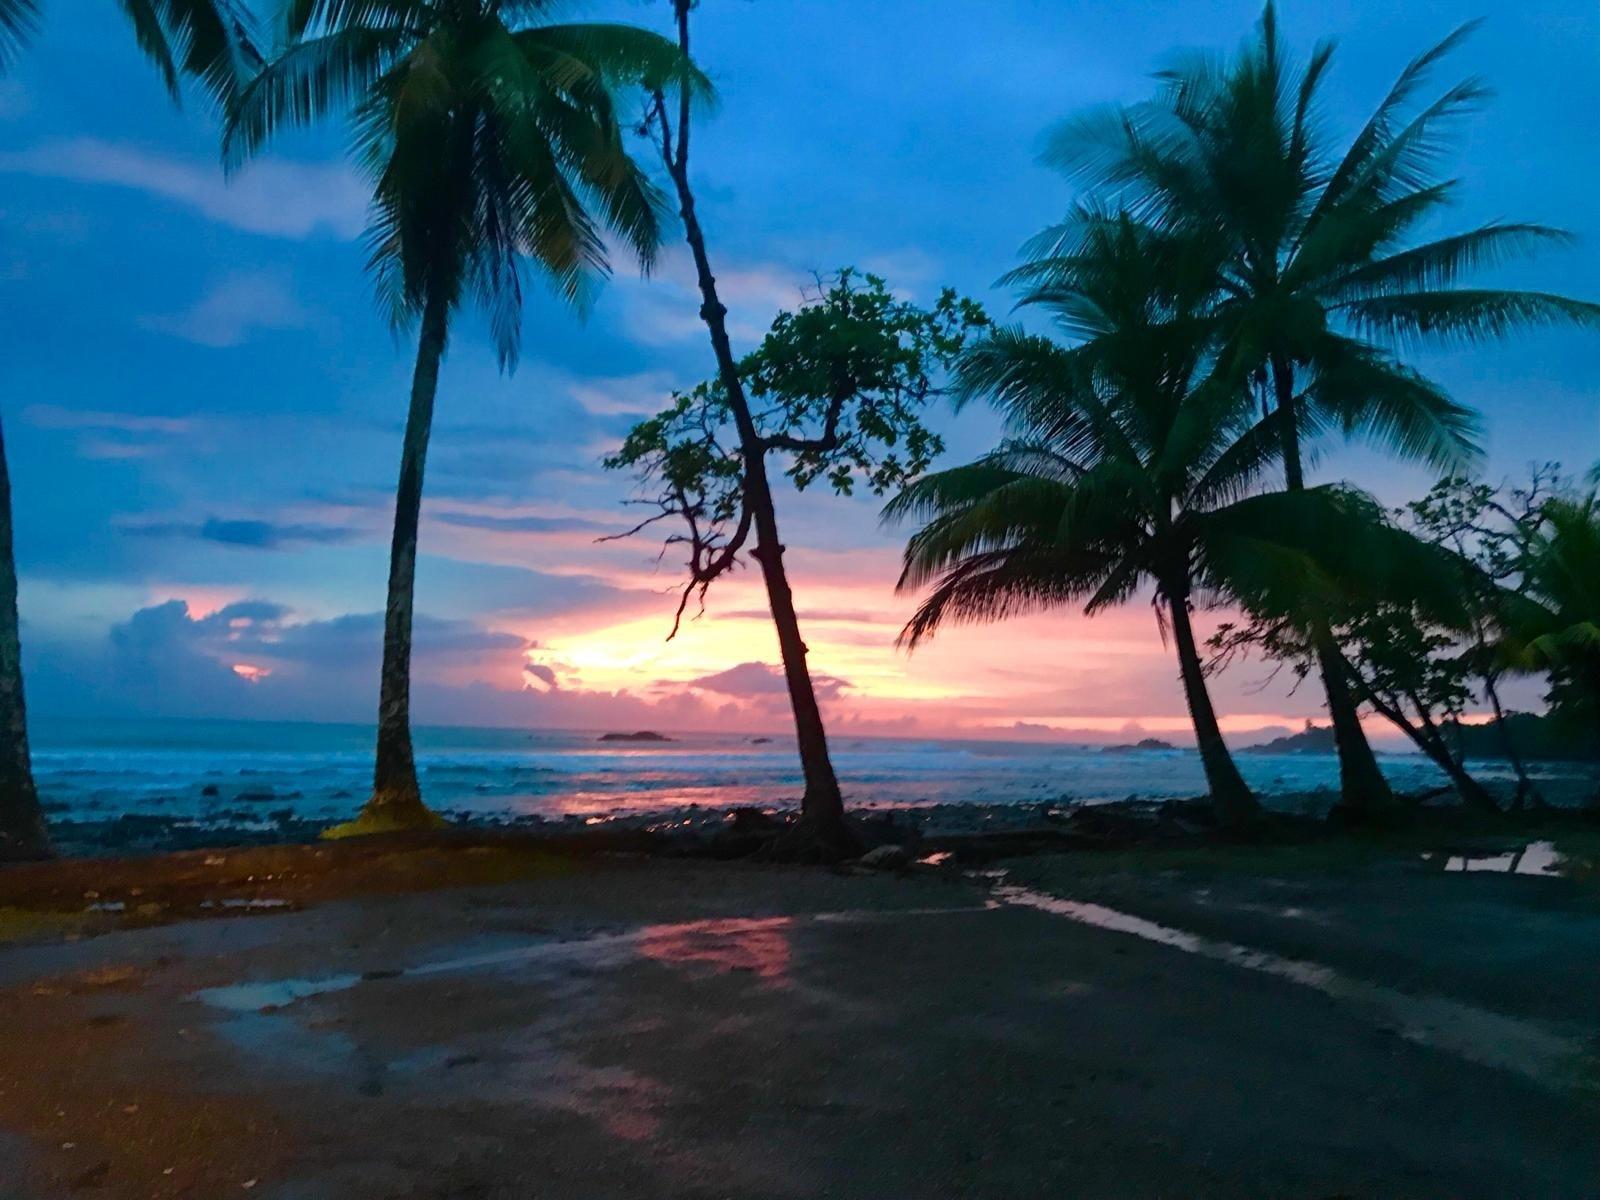 Dominical, Ballena, Puntarenas Province, Costa Rica